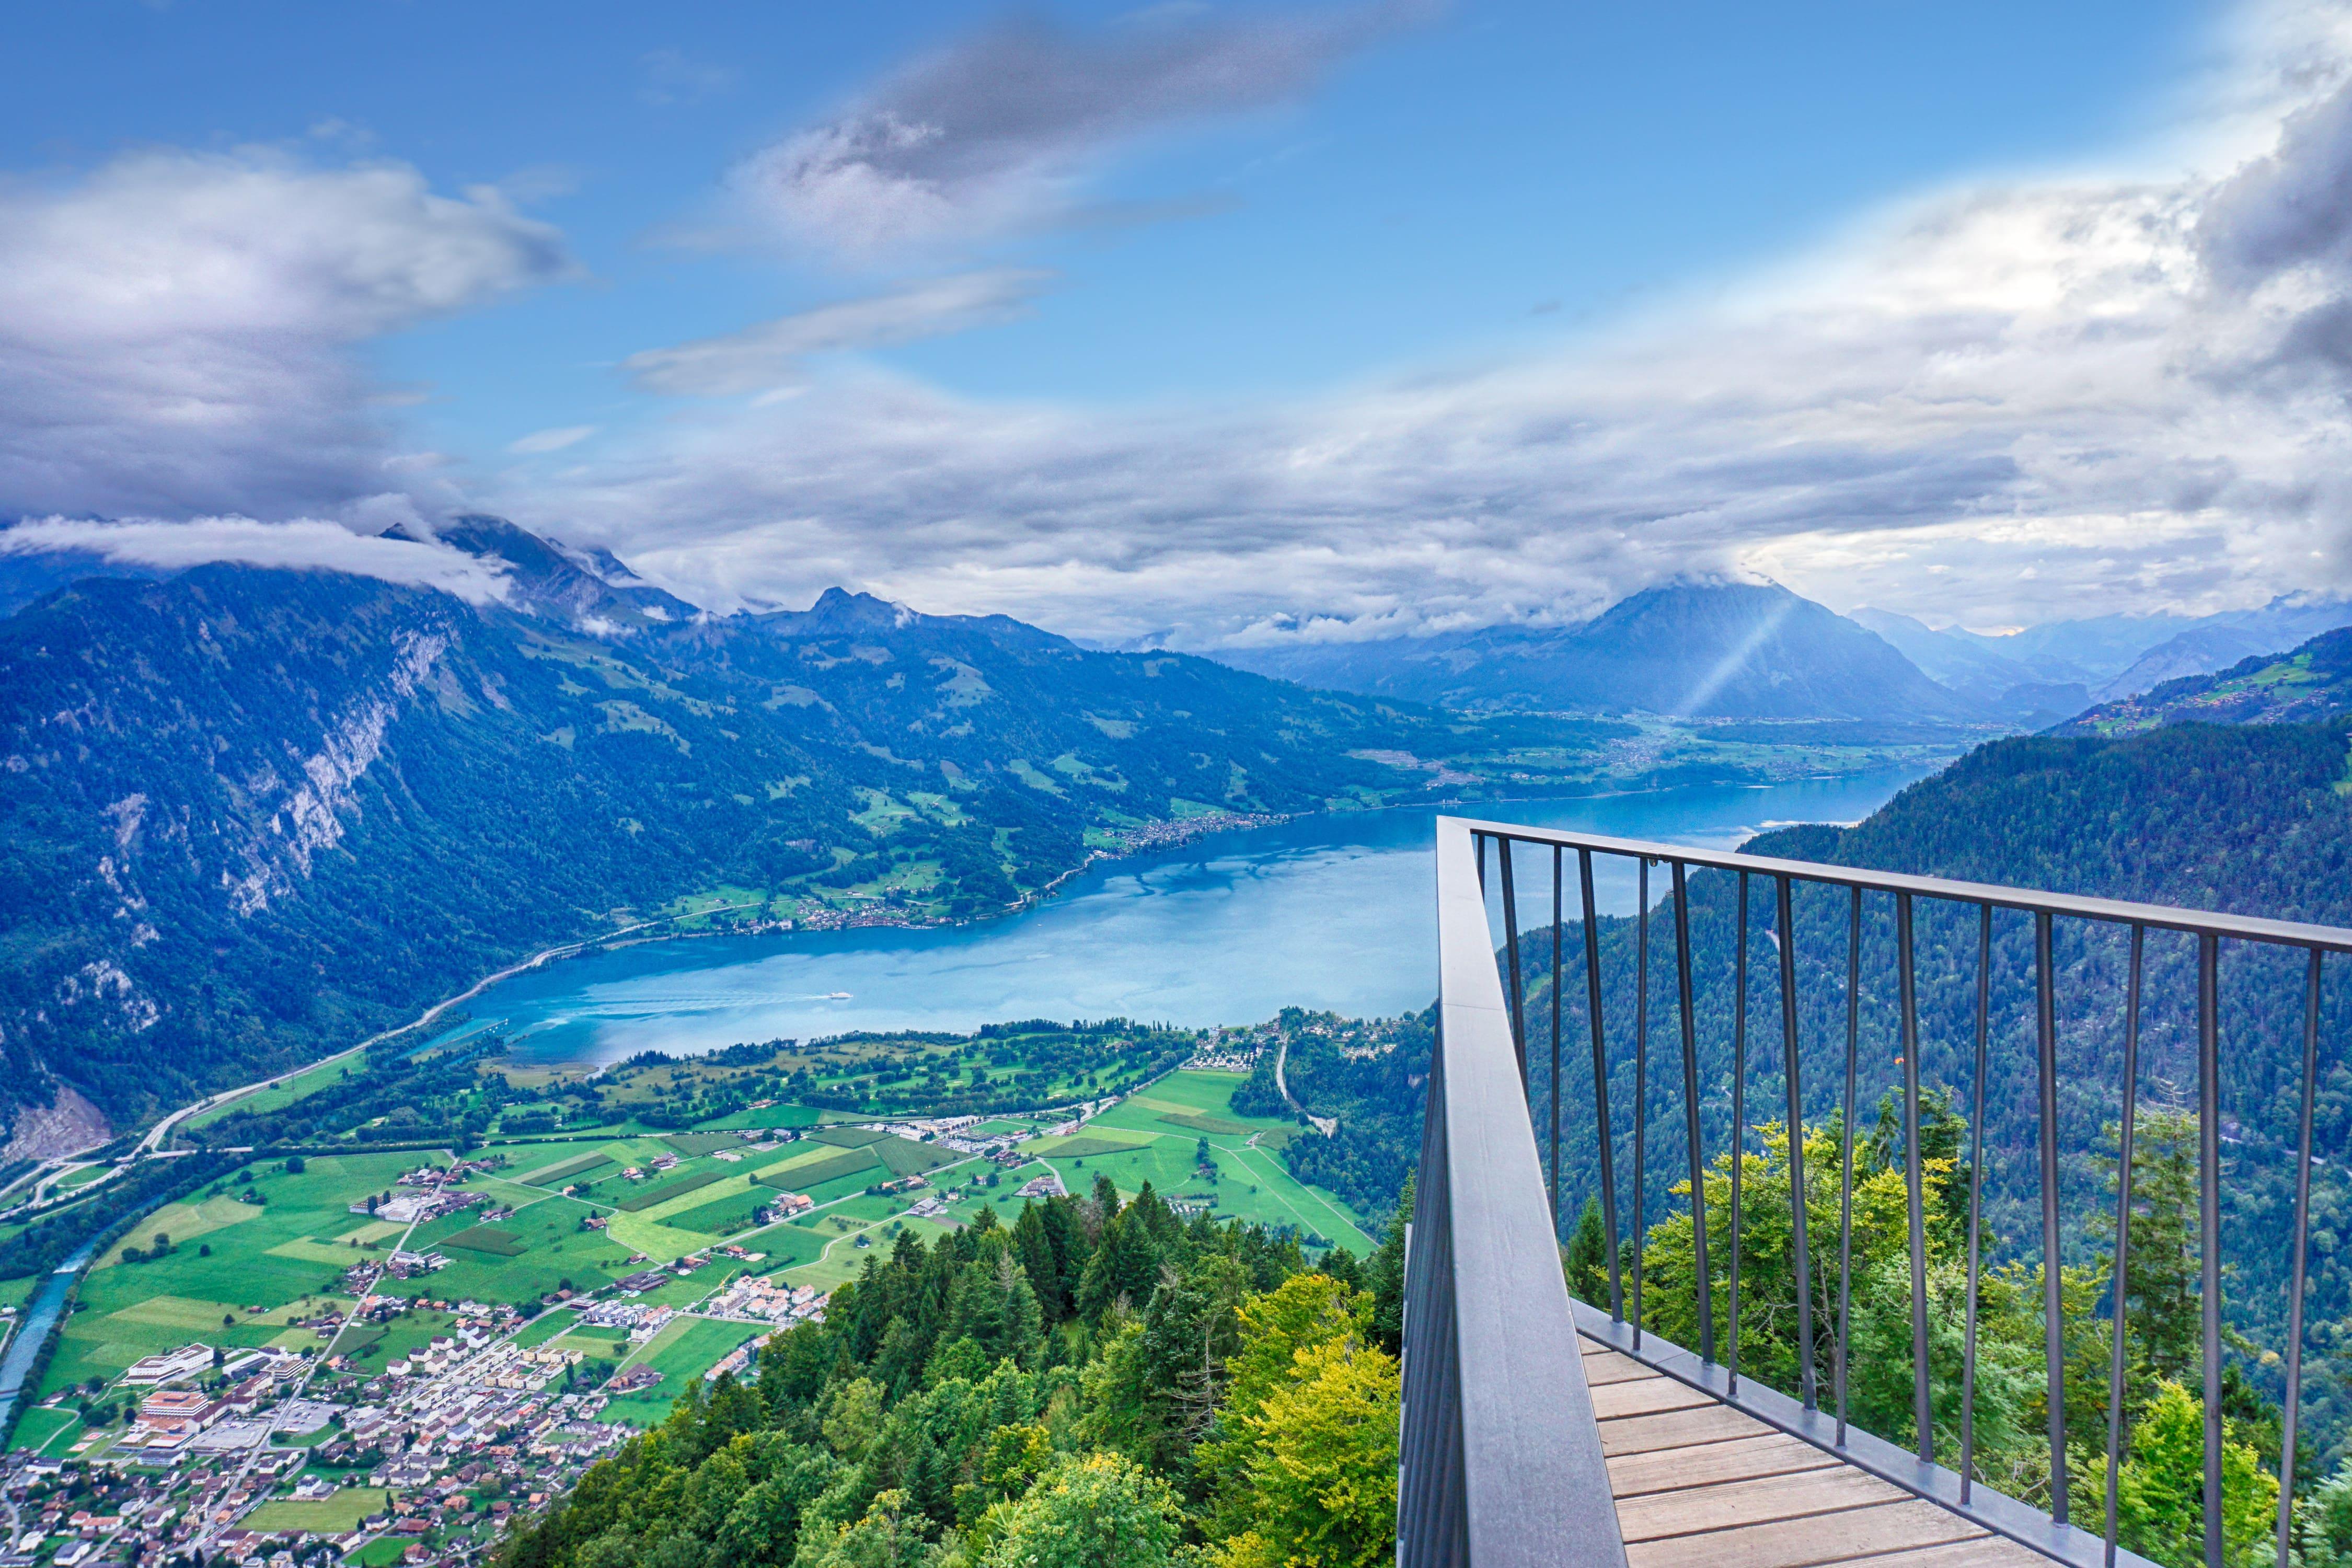 View from Two Lakes Bridge above Interlaken